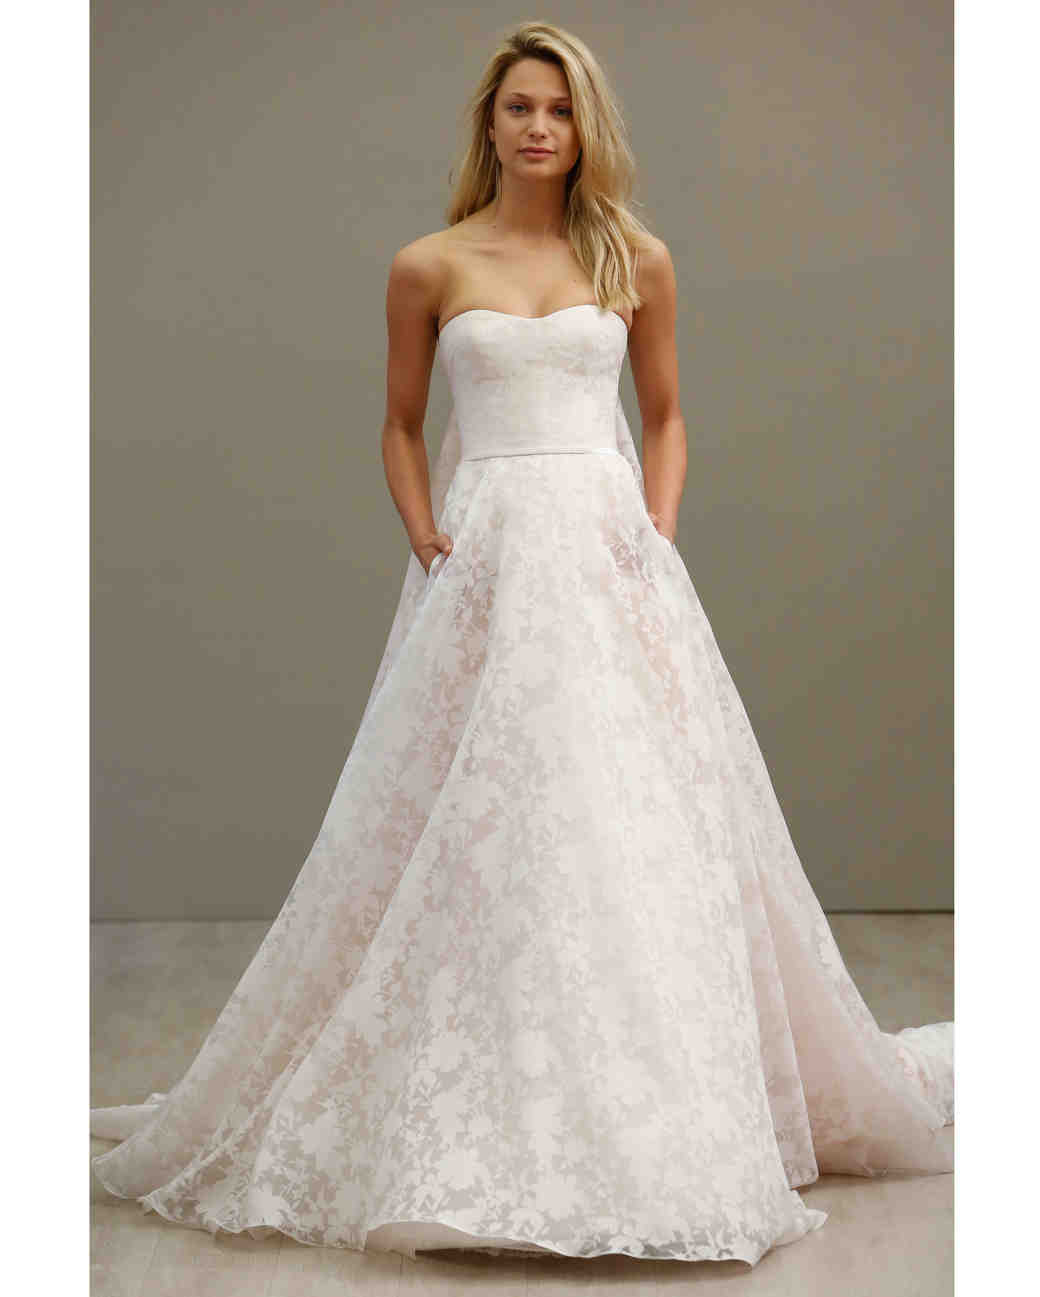 50-states-wedding-dresses-virginia-jim-hjelm-0615.jpg